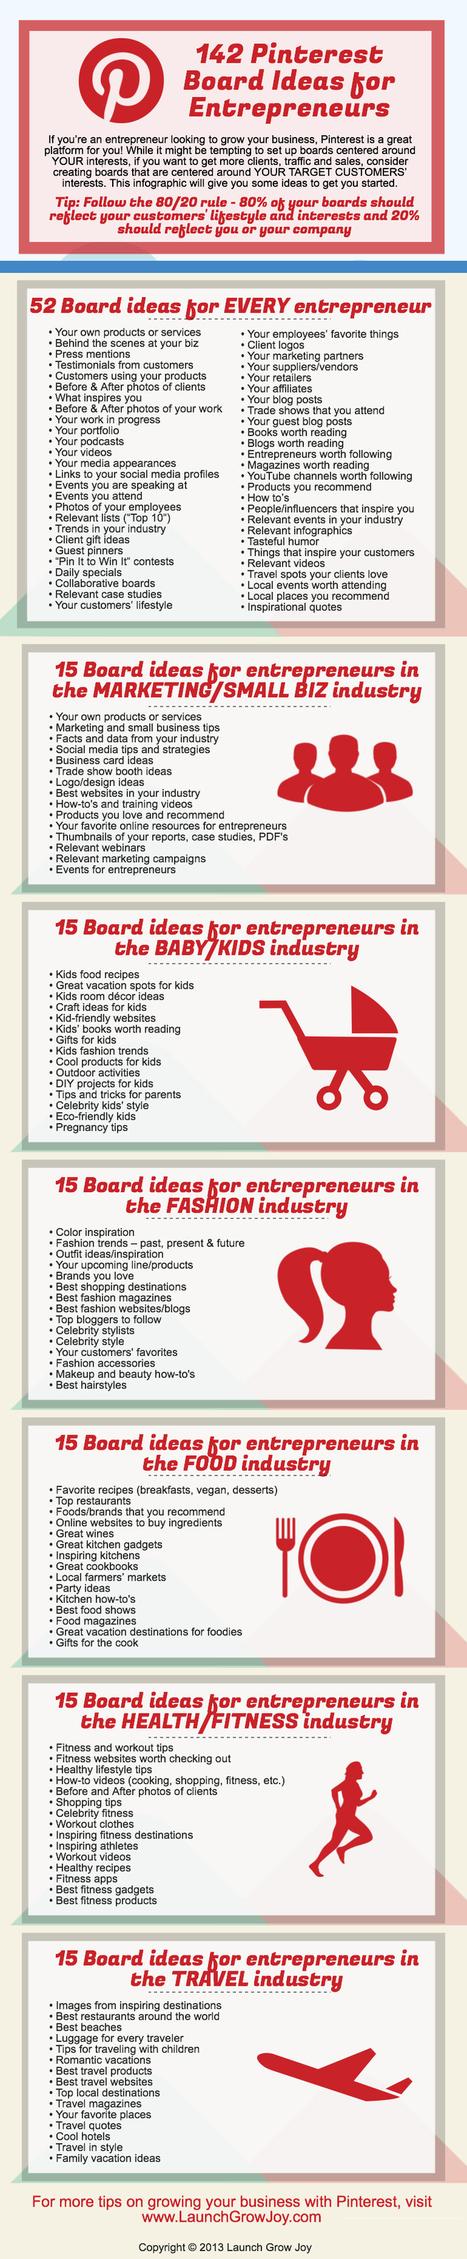 142 Pinterest Board Ideas for Entrepreneurs - Launch Grow Joy | SocialMediaSharing | Scoop.it